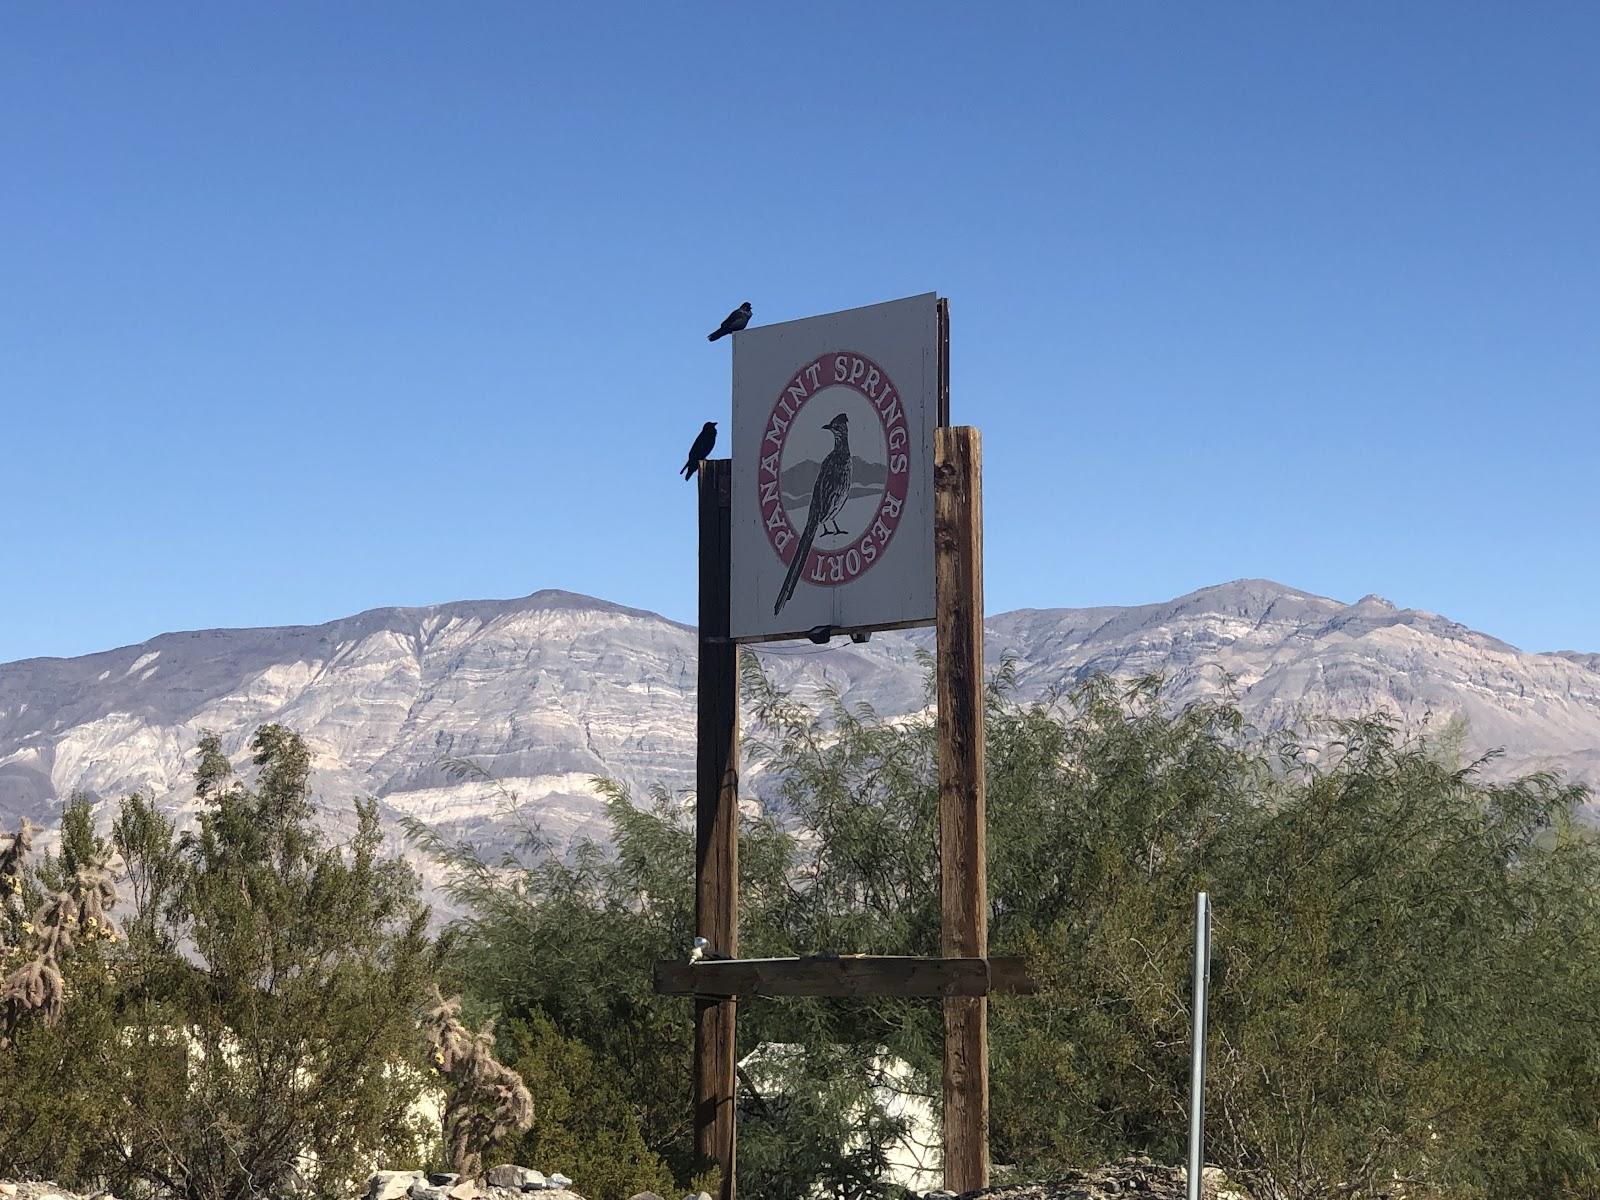 Bike climb Panamint Grade - panamint resort sign with birds on it.